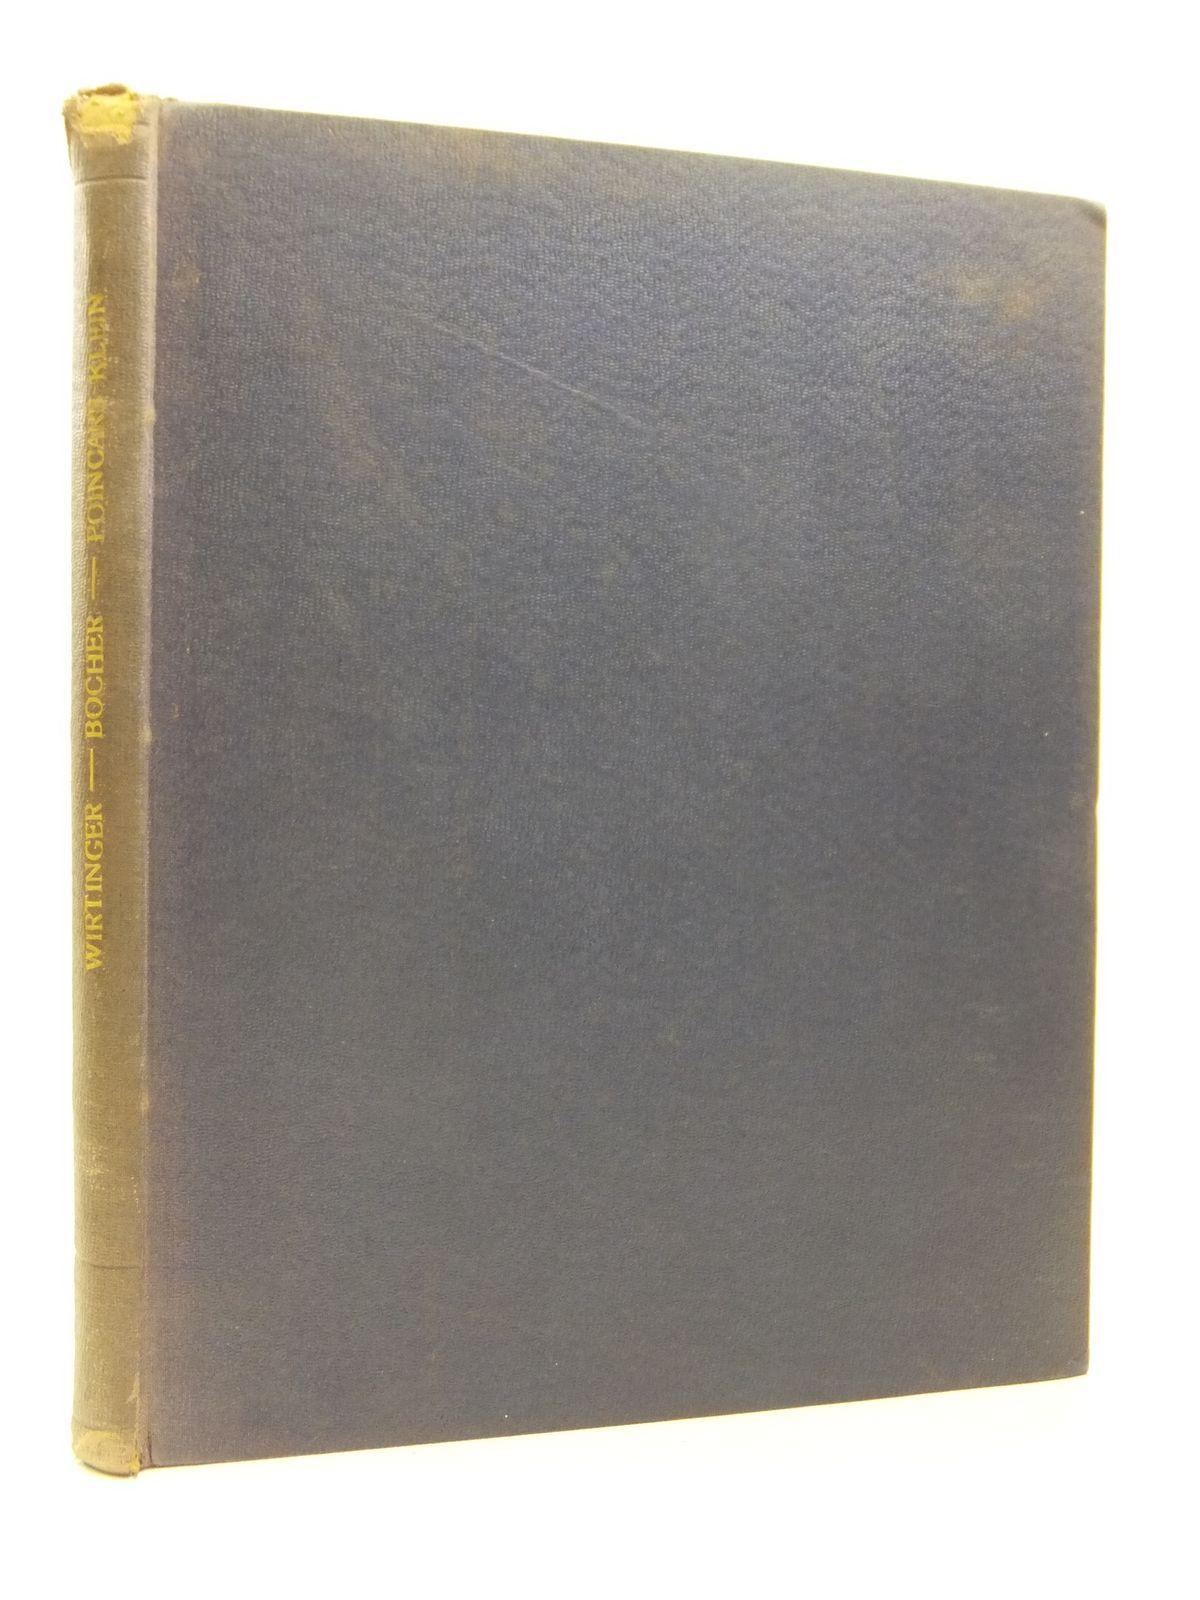 Photo of UNTERSUCHUNGEN UBER THETAFUNCTIONEN: INTRODUCTION TO THE THEORY OF FOURIER'S SERIES: CORRESPONDANCE D'HENRI POINCARE ET DE FELIX KLIEN written by Wirtinger, Wilhelm<br />Bocher, Maxime<br />Poincare, Henri<br />Klein, Felix published by Druck Und Verlag Von B.G. Teubner, Harvard University Press (STOCK CODE: 2120901)  for sale by Stella & Rose's Books